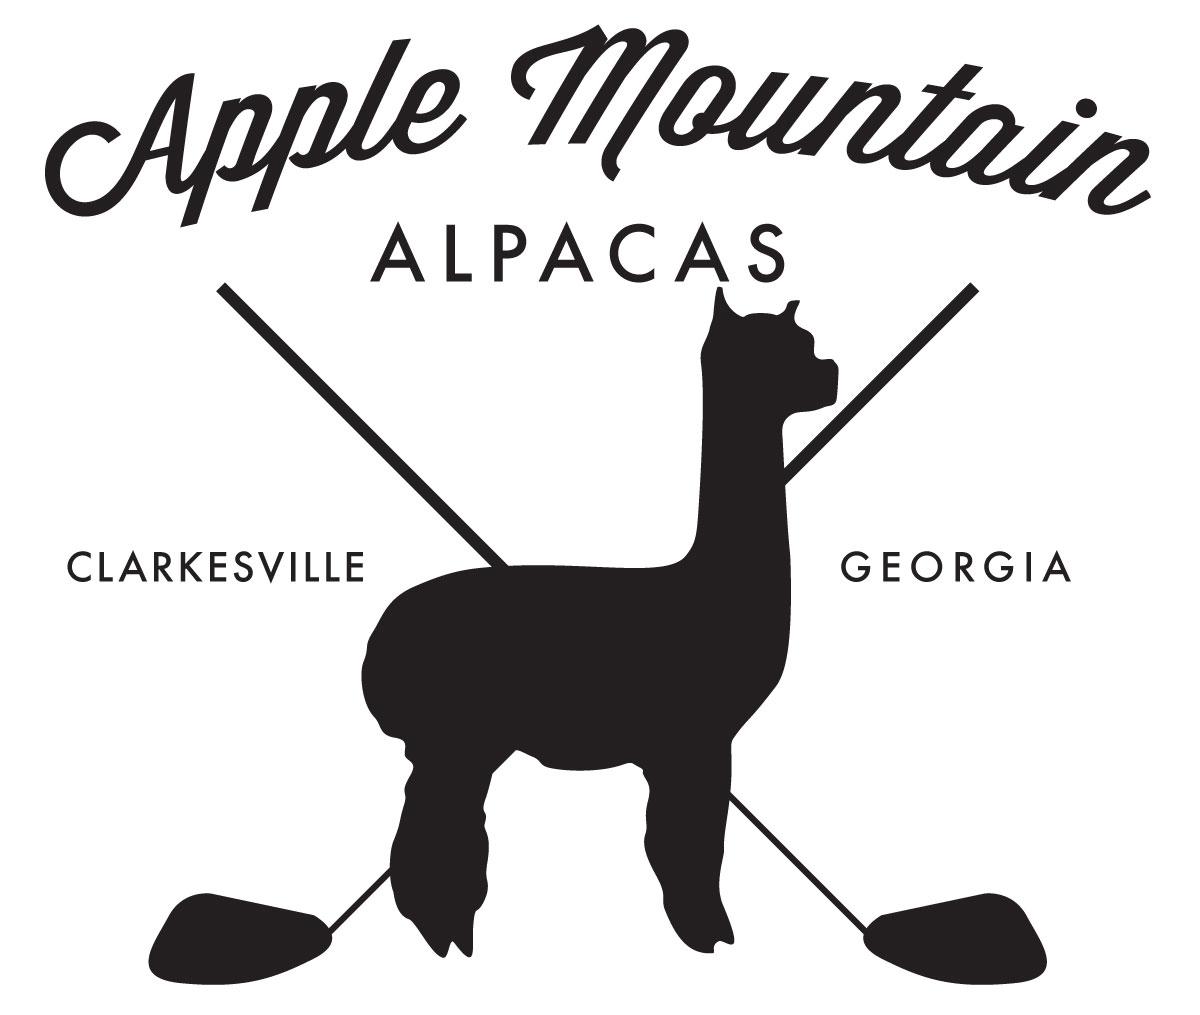 Apple Mountain Alpacas